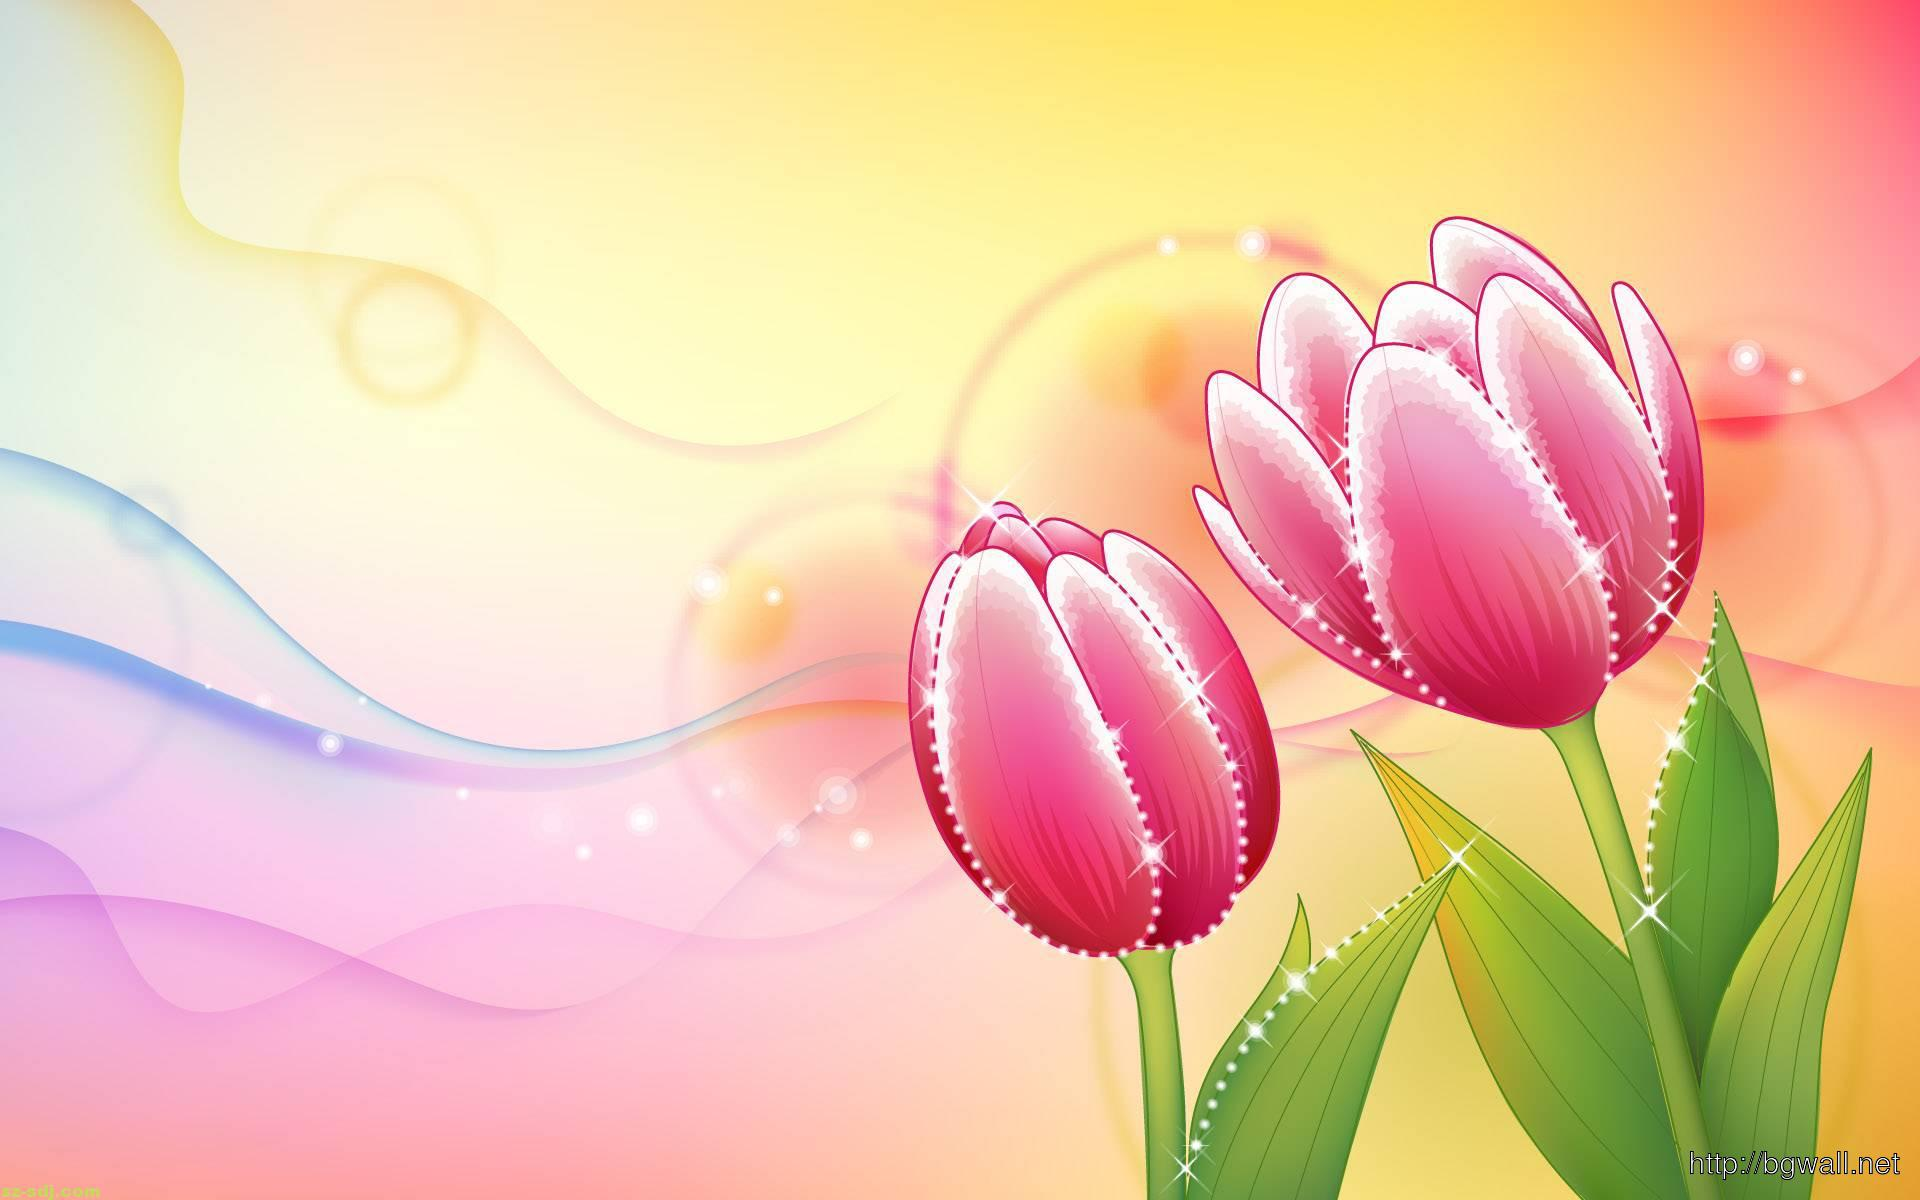 Flowers Art Painting Wallpaper Hd U2013 Background Design